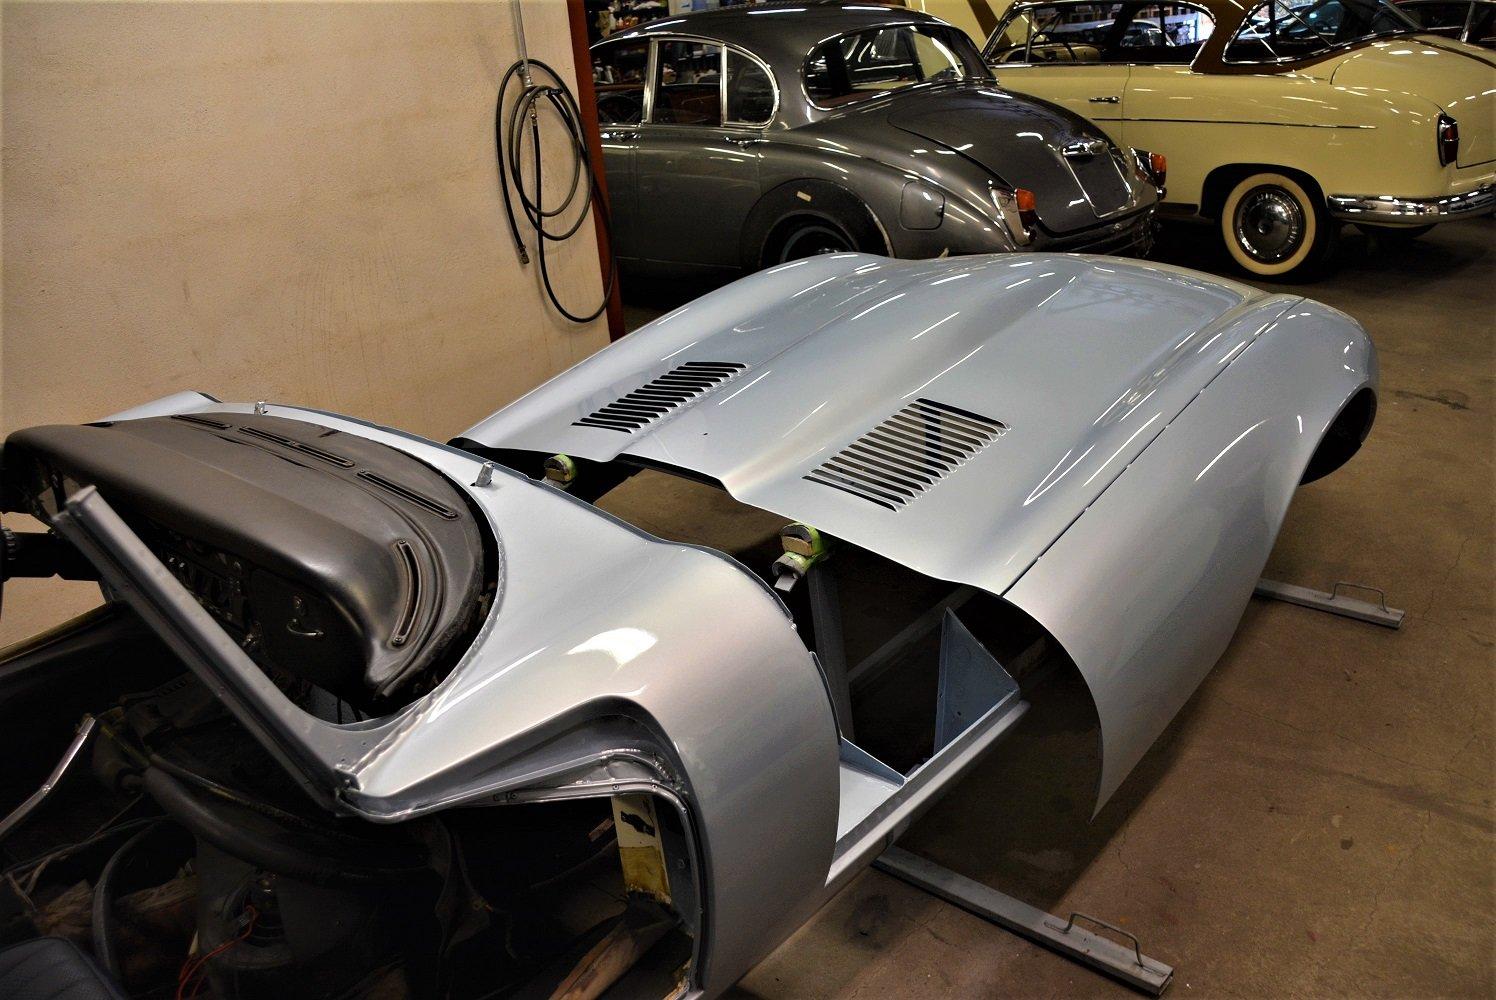 Jaguar E-Type 5,3l V12 Rdst S III 1973 For Sale (picture 4 of 6)